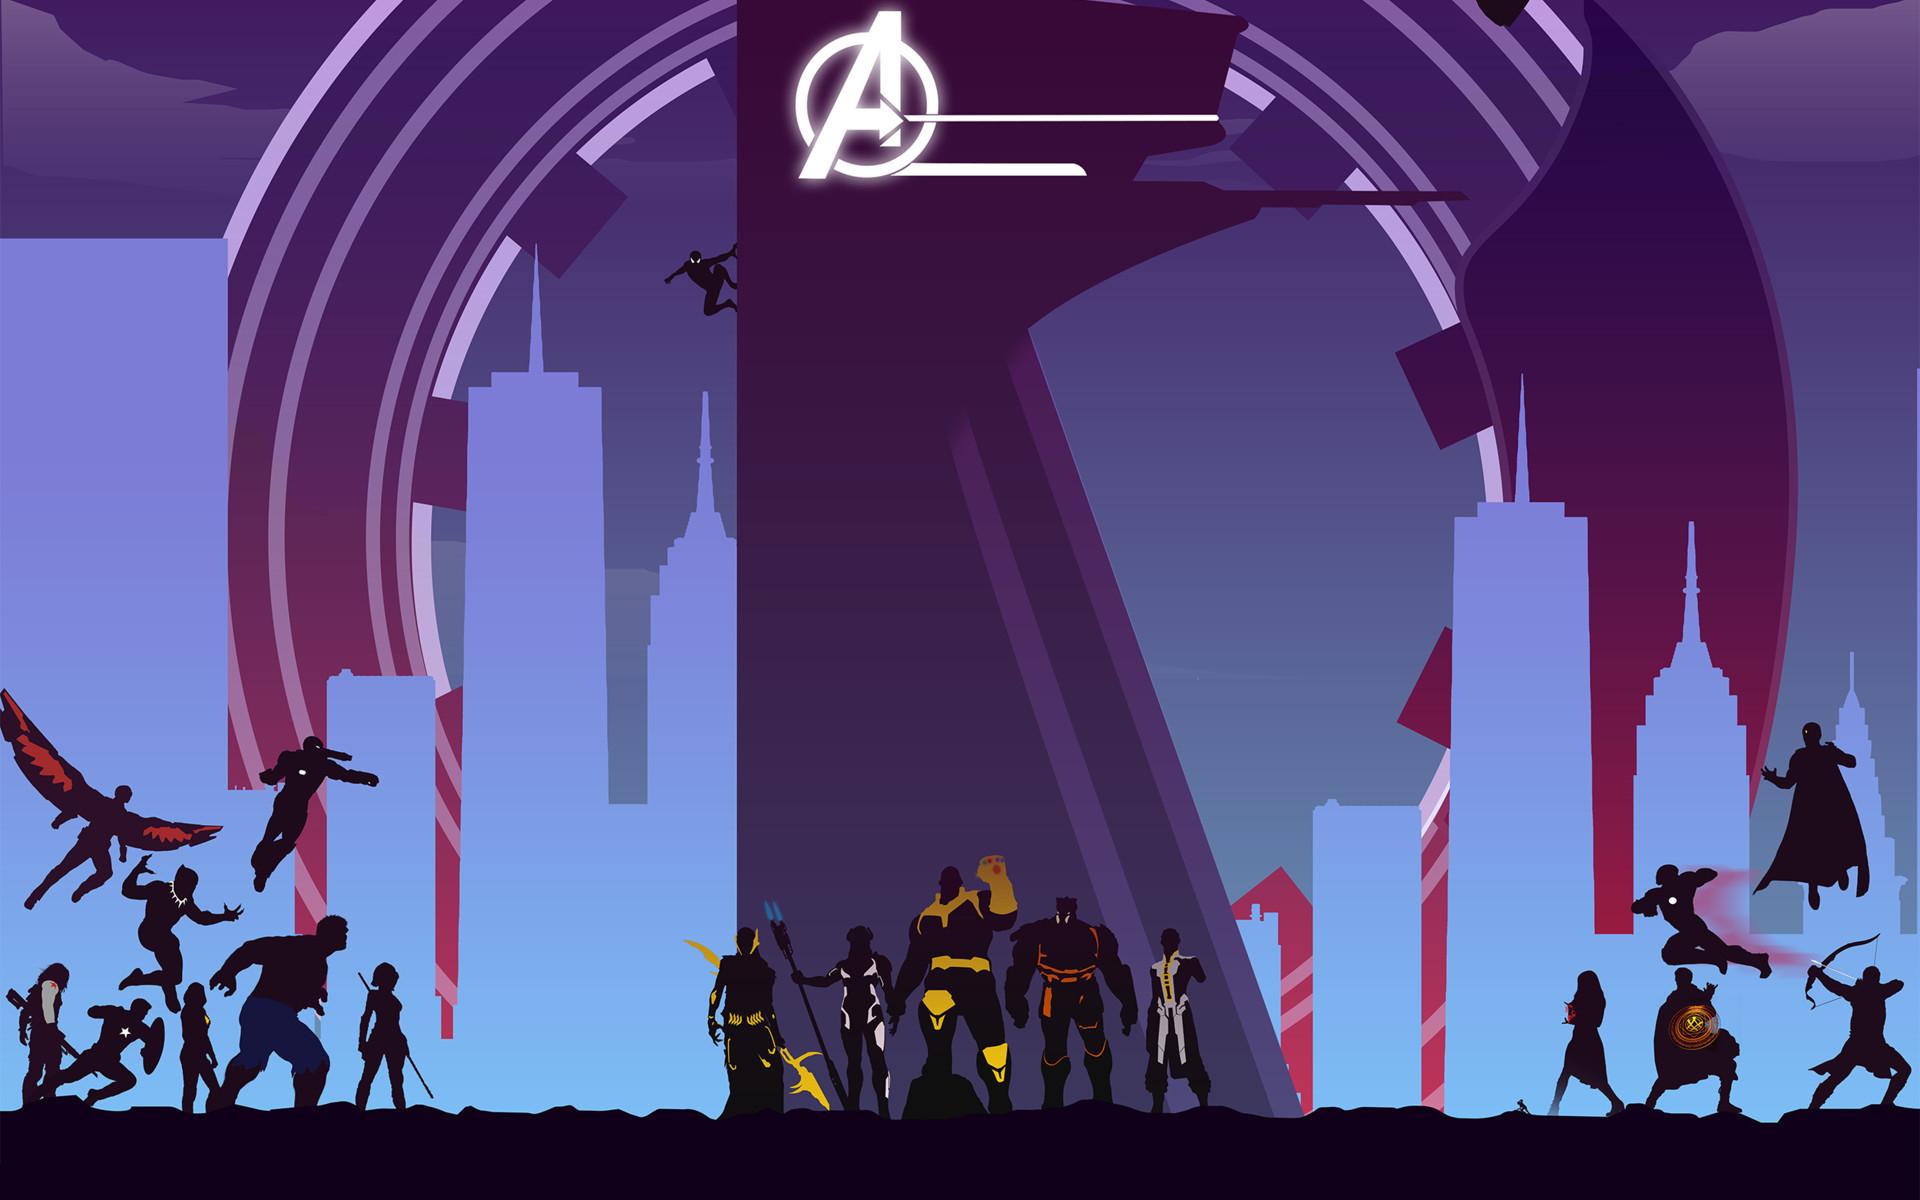 Cute Infinity Symbol Wallpaper Avengers Infinity War Artwork Minimal Wallpapers Hd